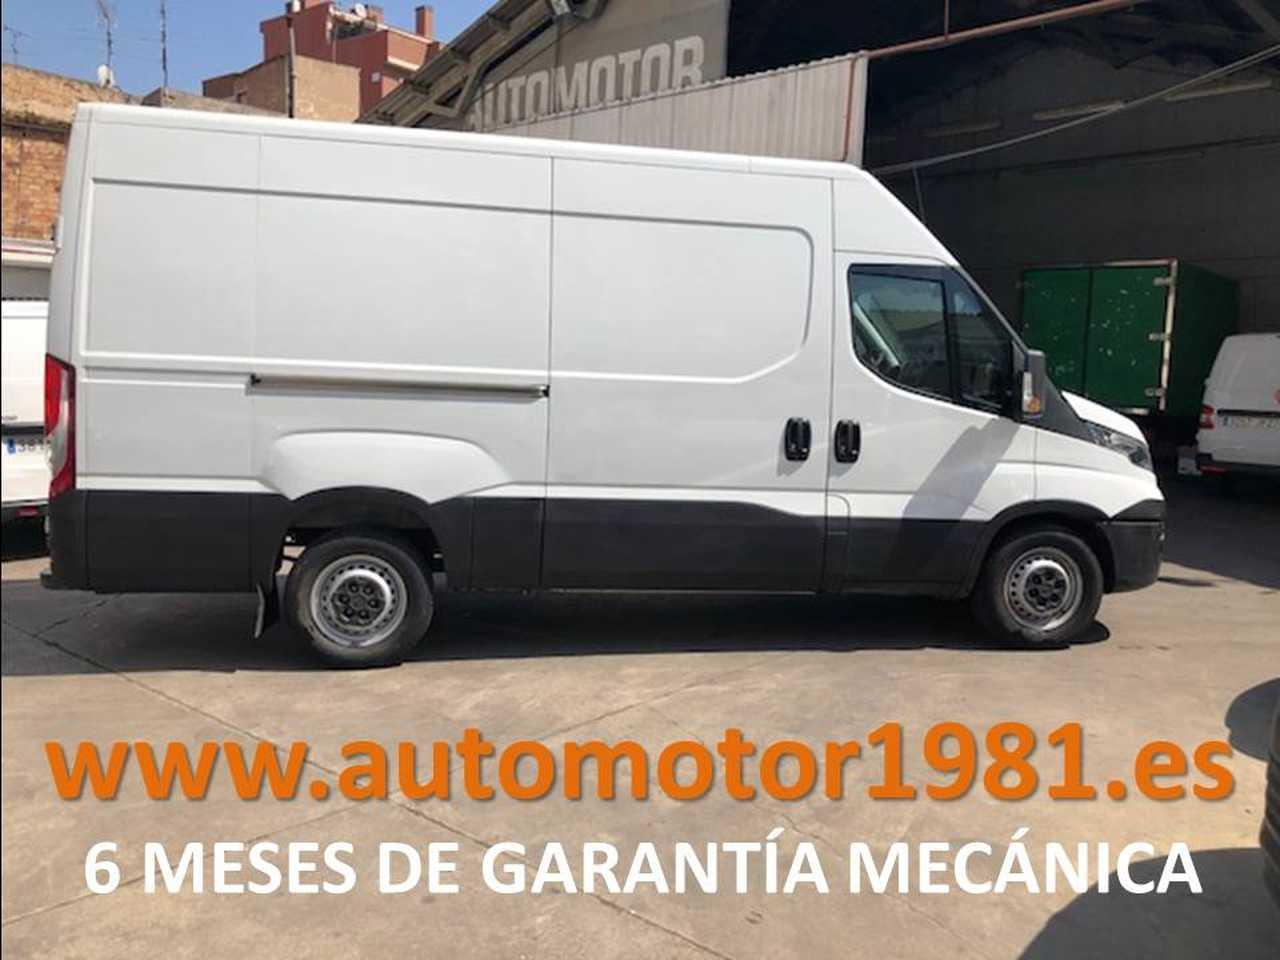 Iveco Daily 35 S 11 L3H2 FURGON - 6 MESES GARANTIA MECANICA  - Foto 1